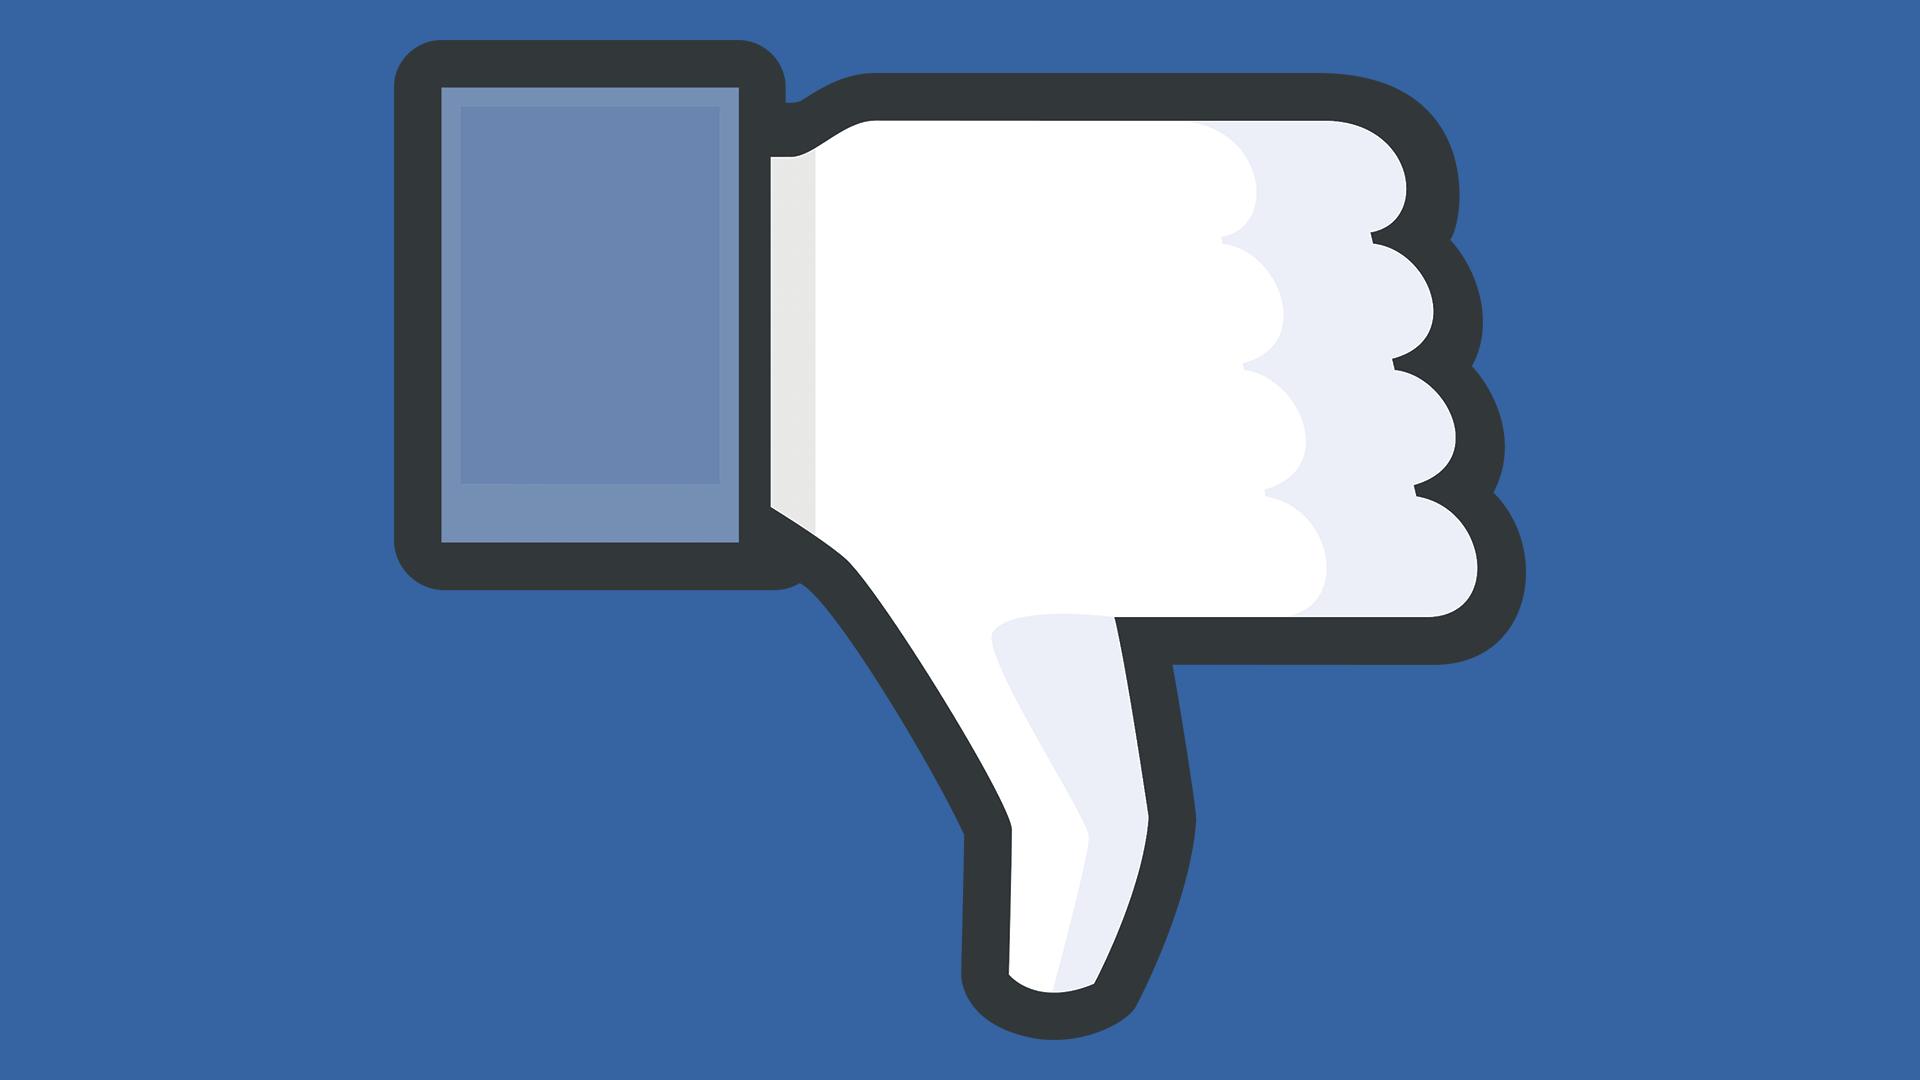 Ogromna awaria! Facebook, Messenger i Instagram nie działają! 17 Facebook